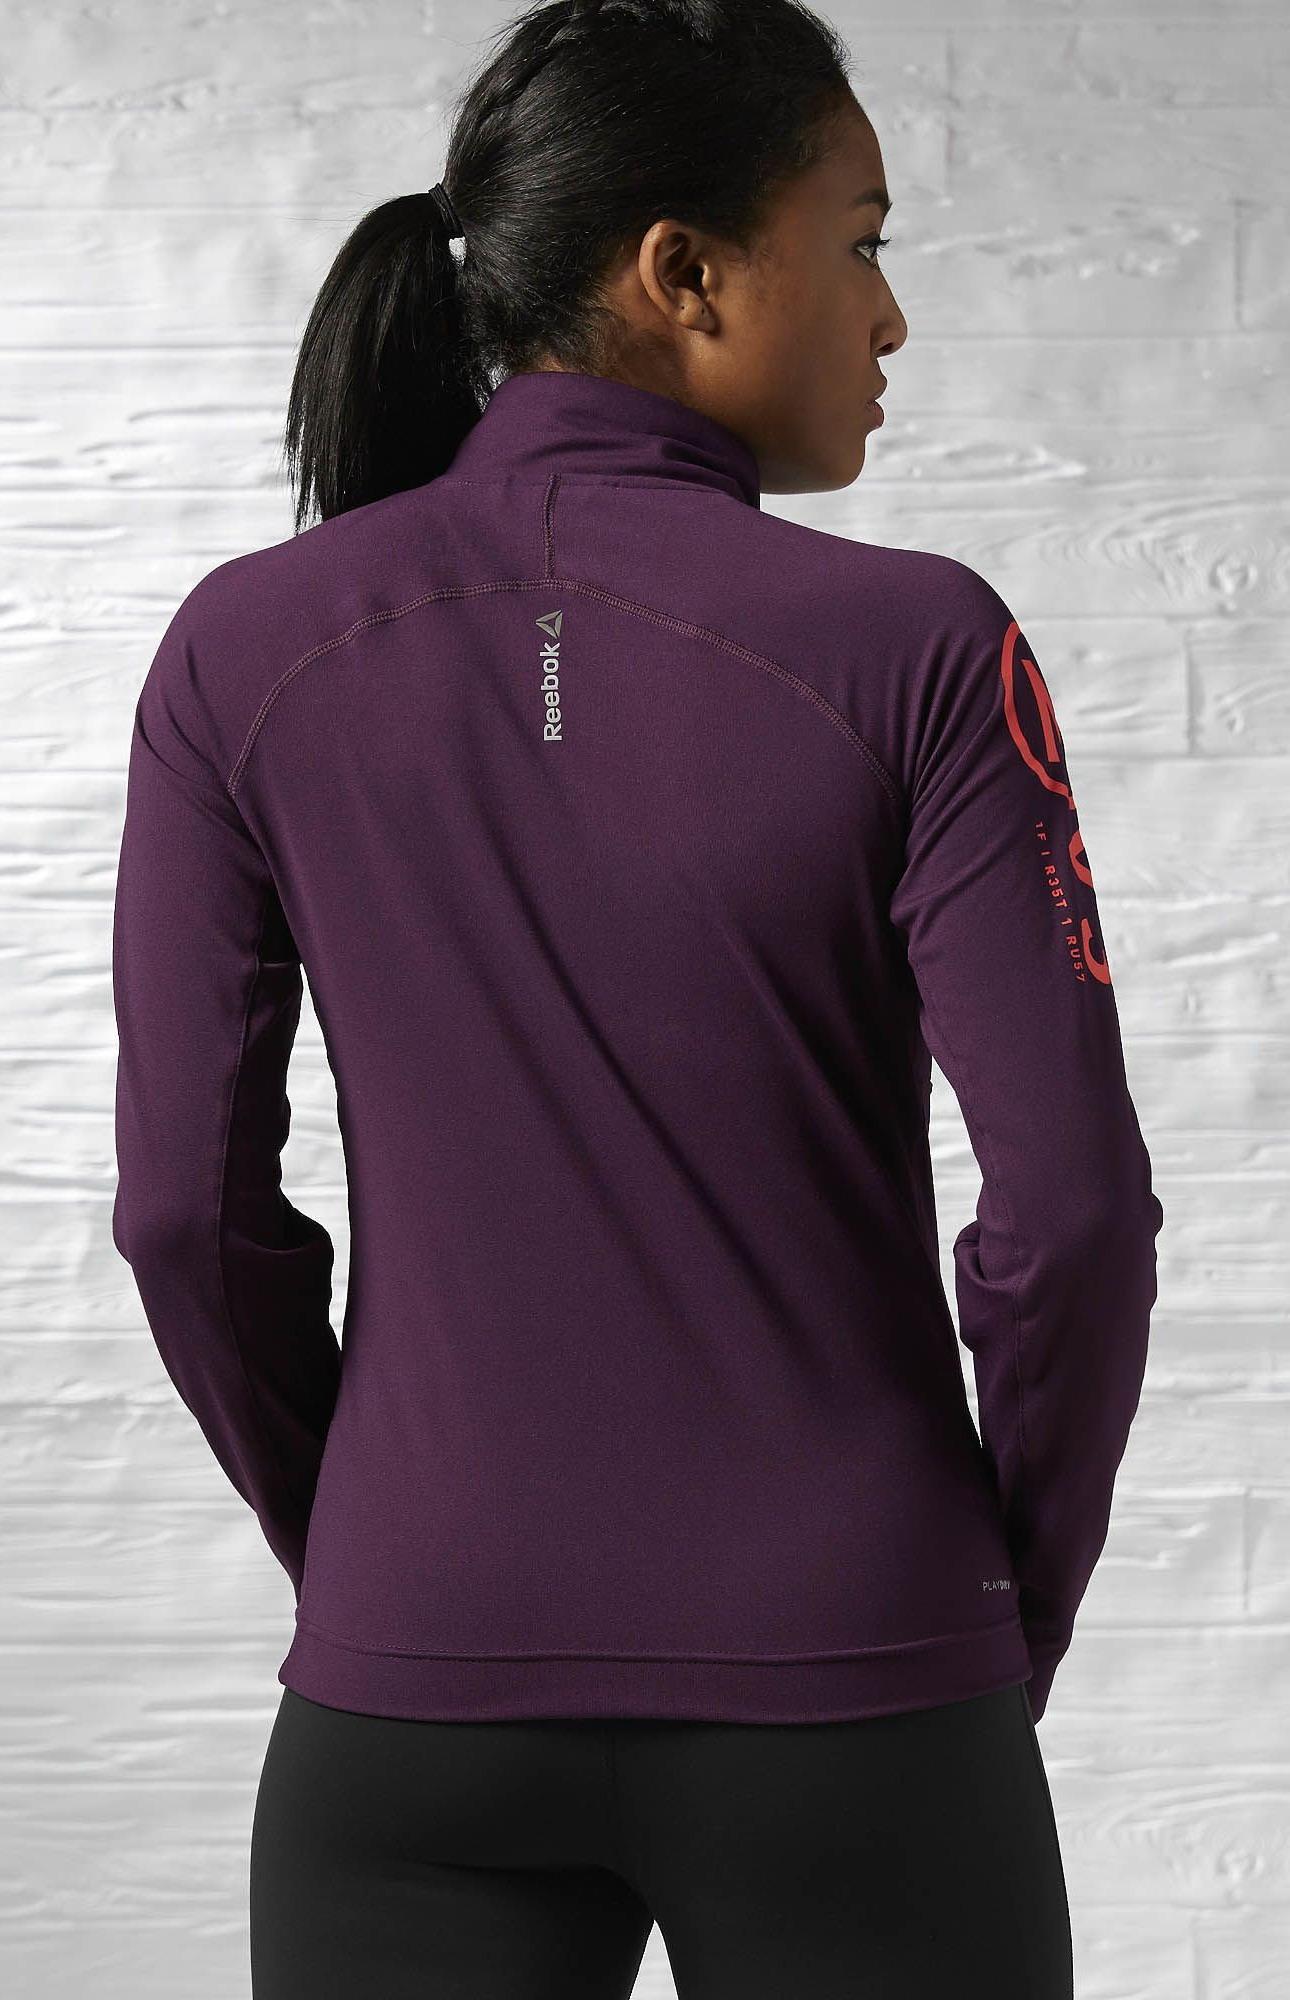 fb82b0e0638401 Reebok OS Graphic Track Jacket bluza damska - M - 7125341550 ...